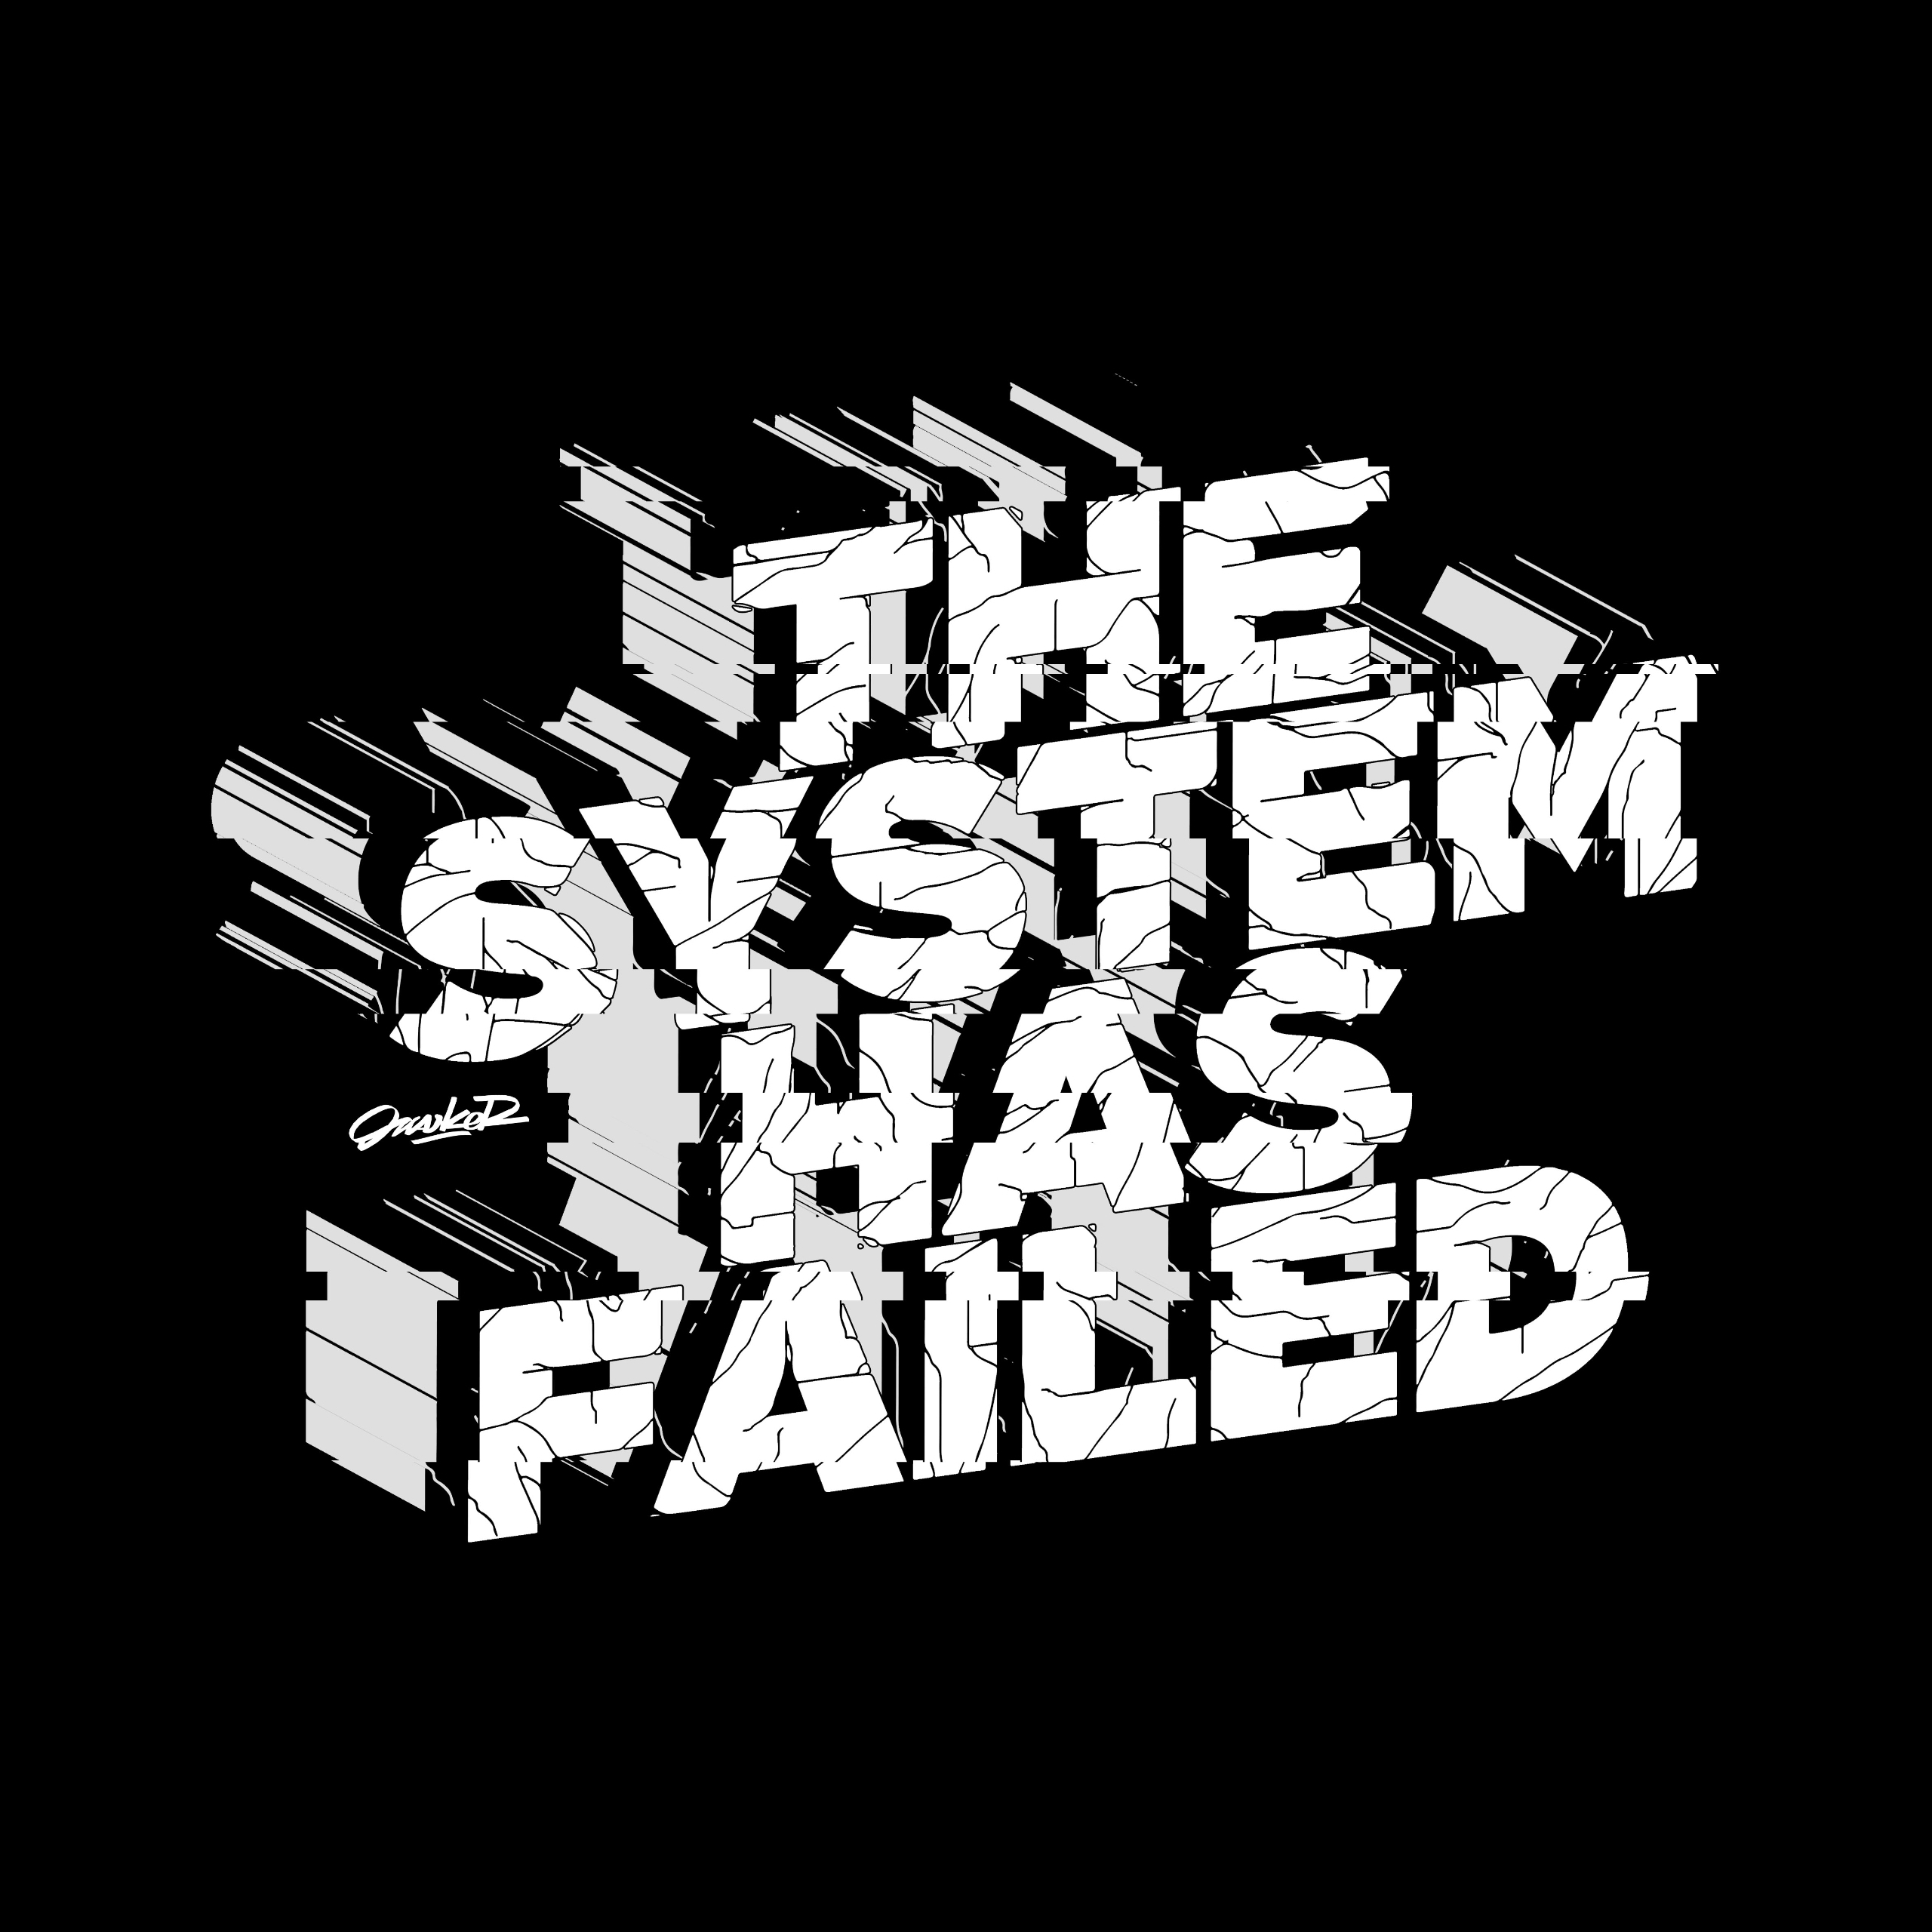 Omarker - System Failed Julien  - omarker | ello